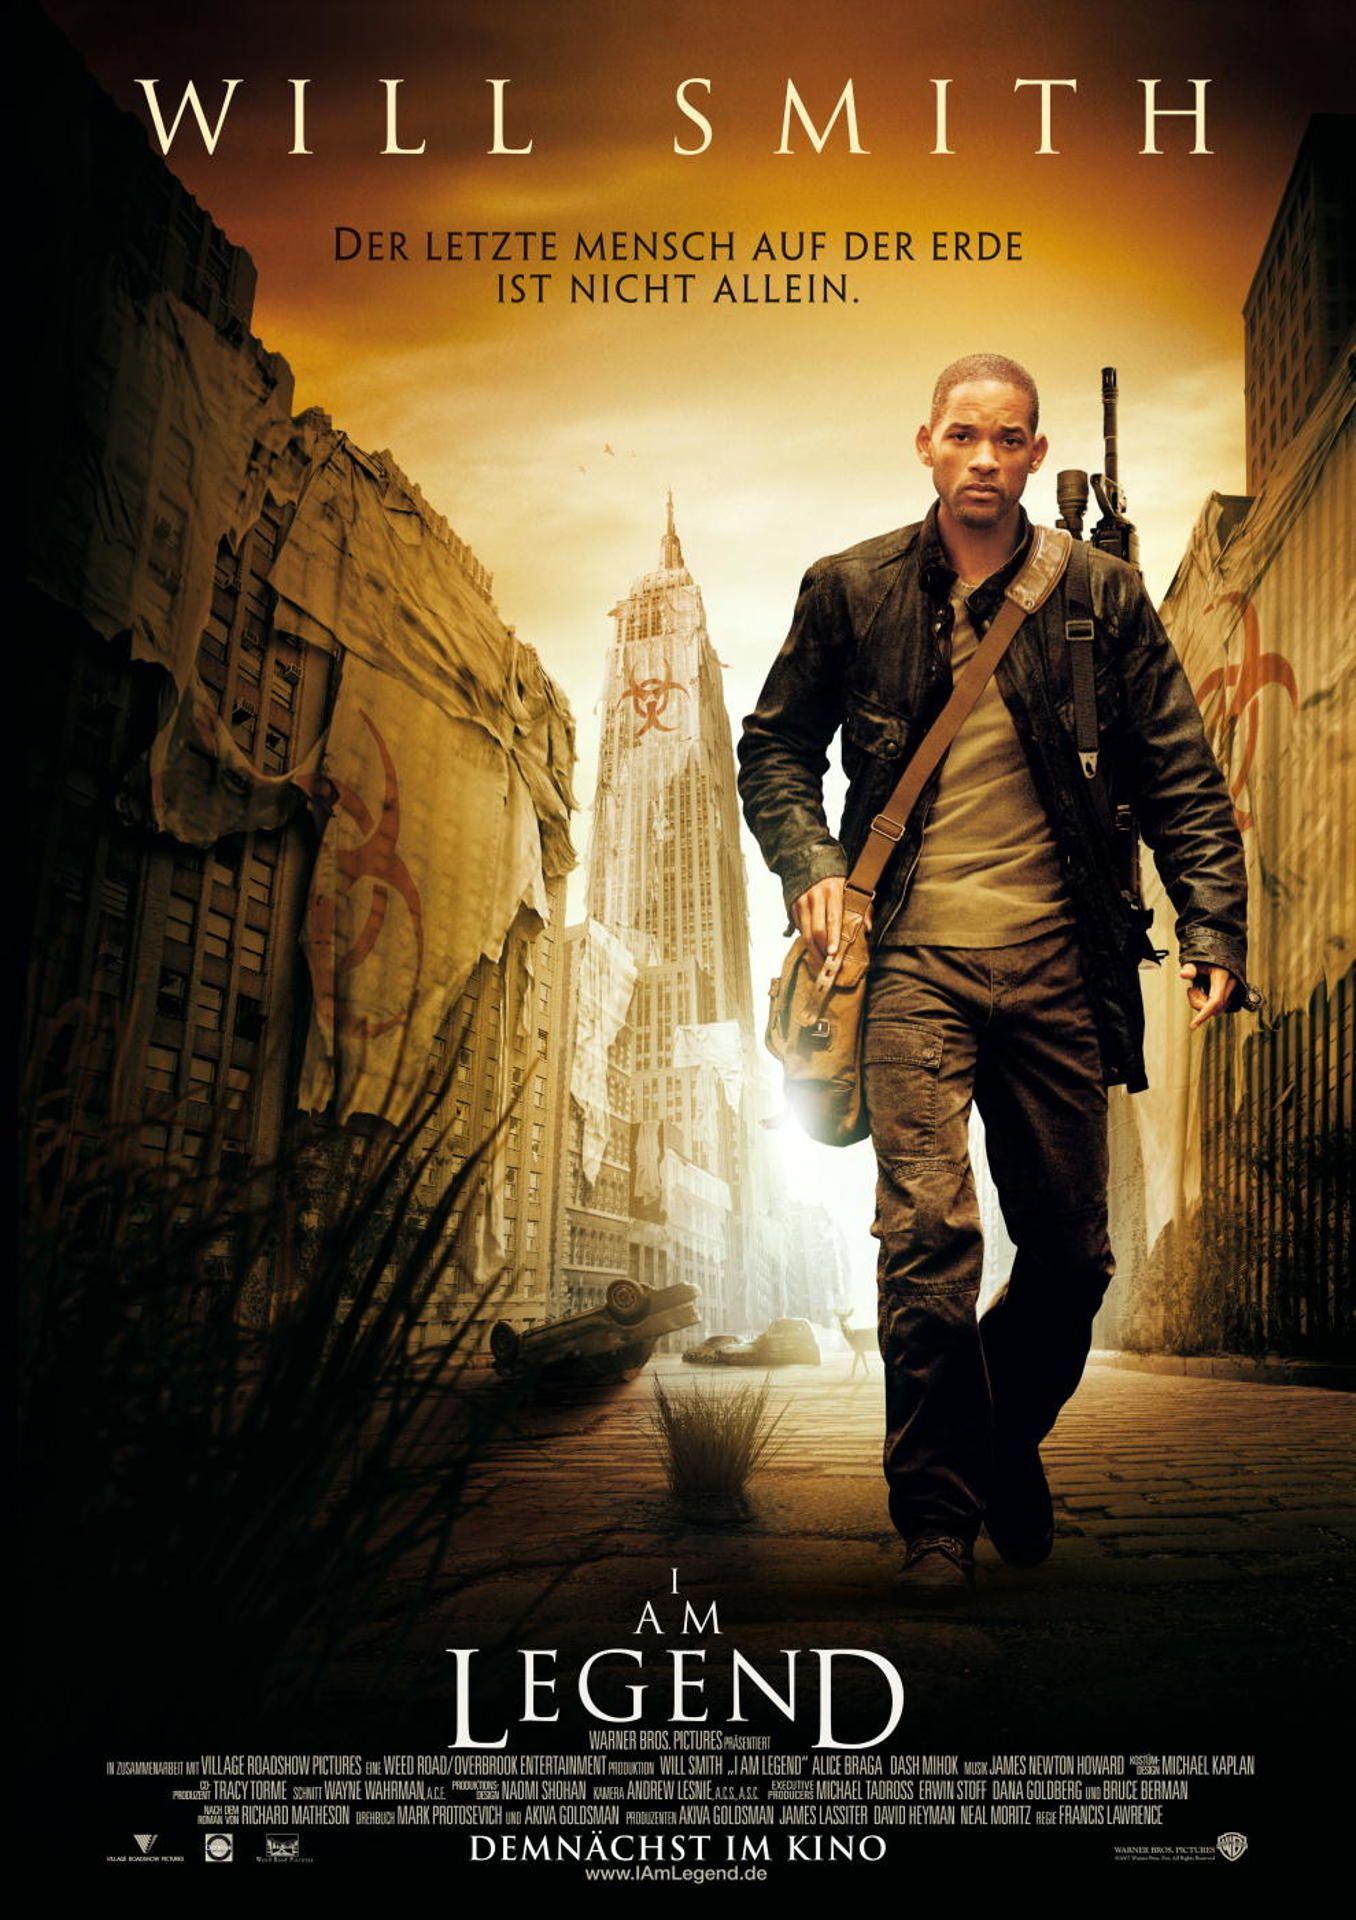 I Am Legend Poster Filme Film Musik Bucher Coole Filme